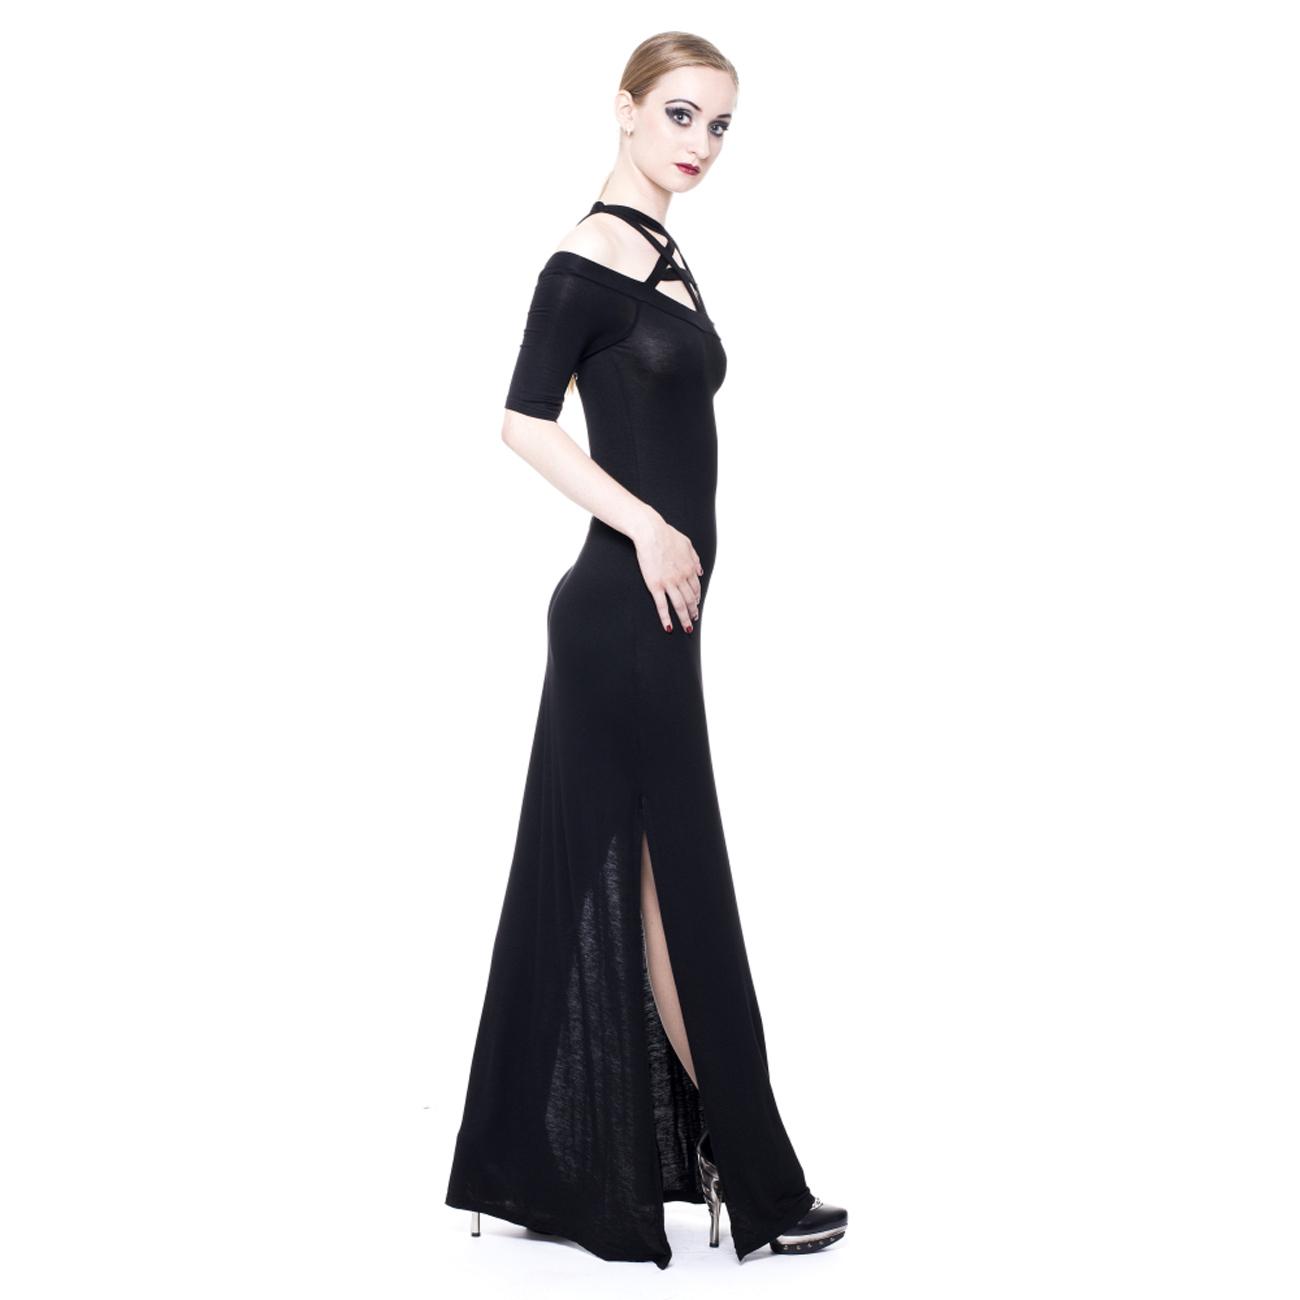 Langes schwarzes jerseykleid